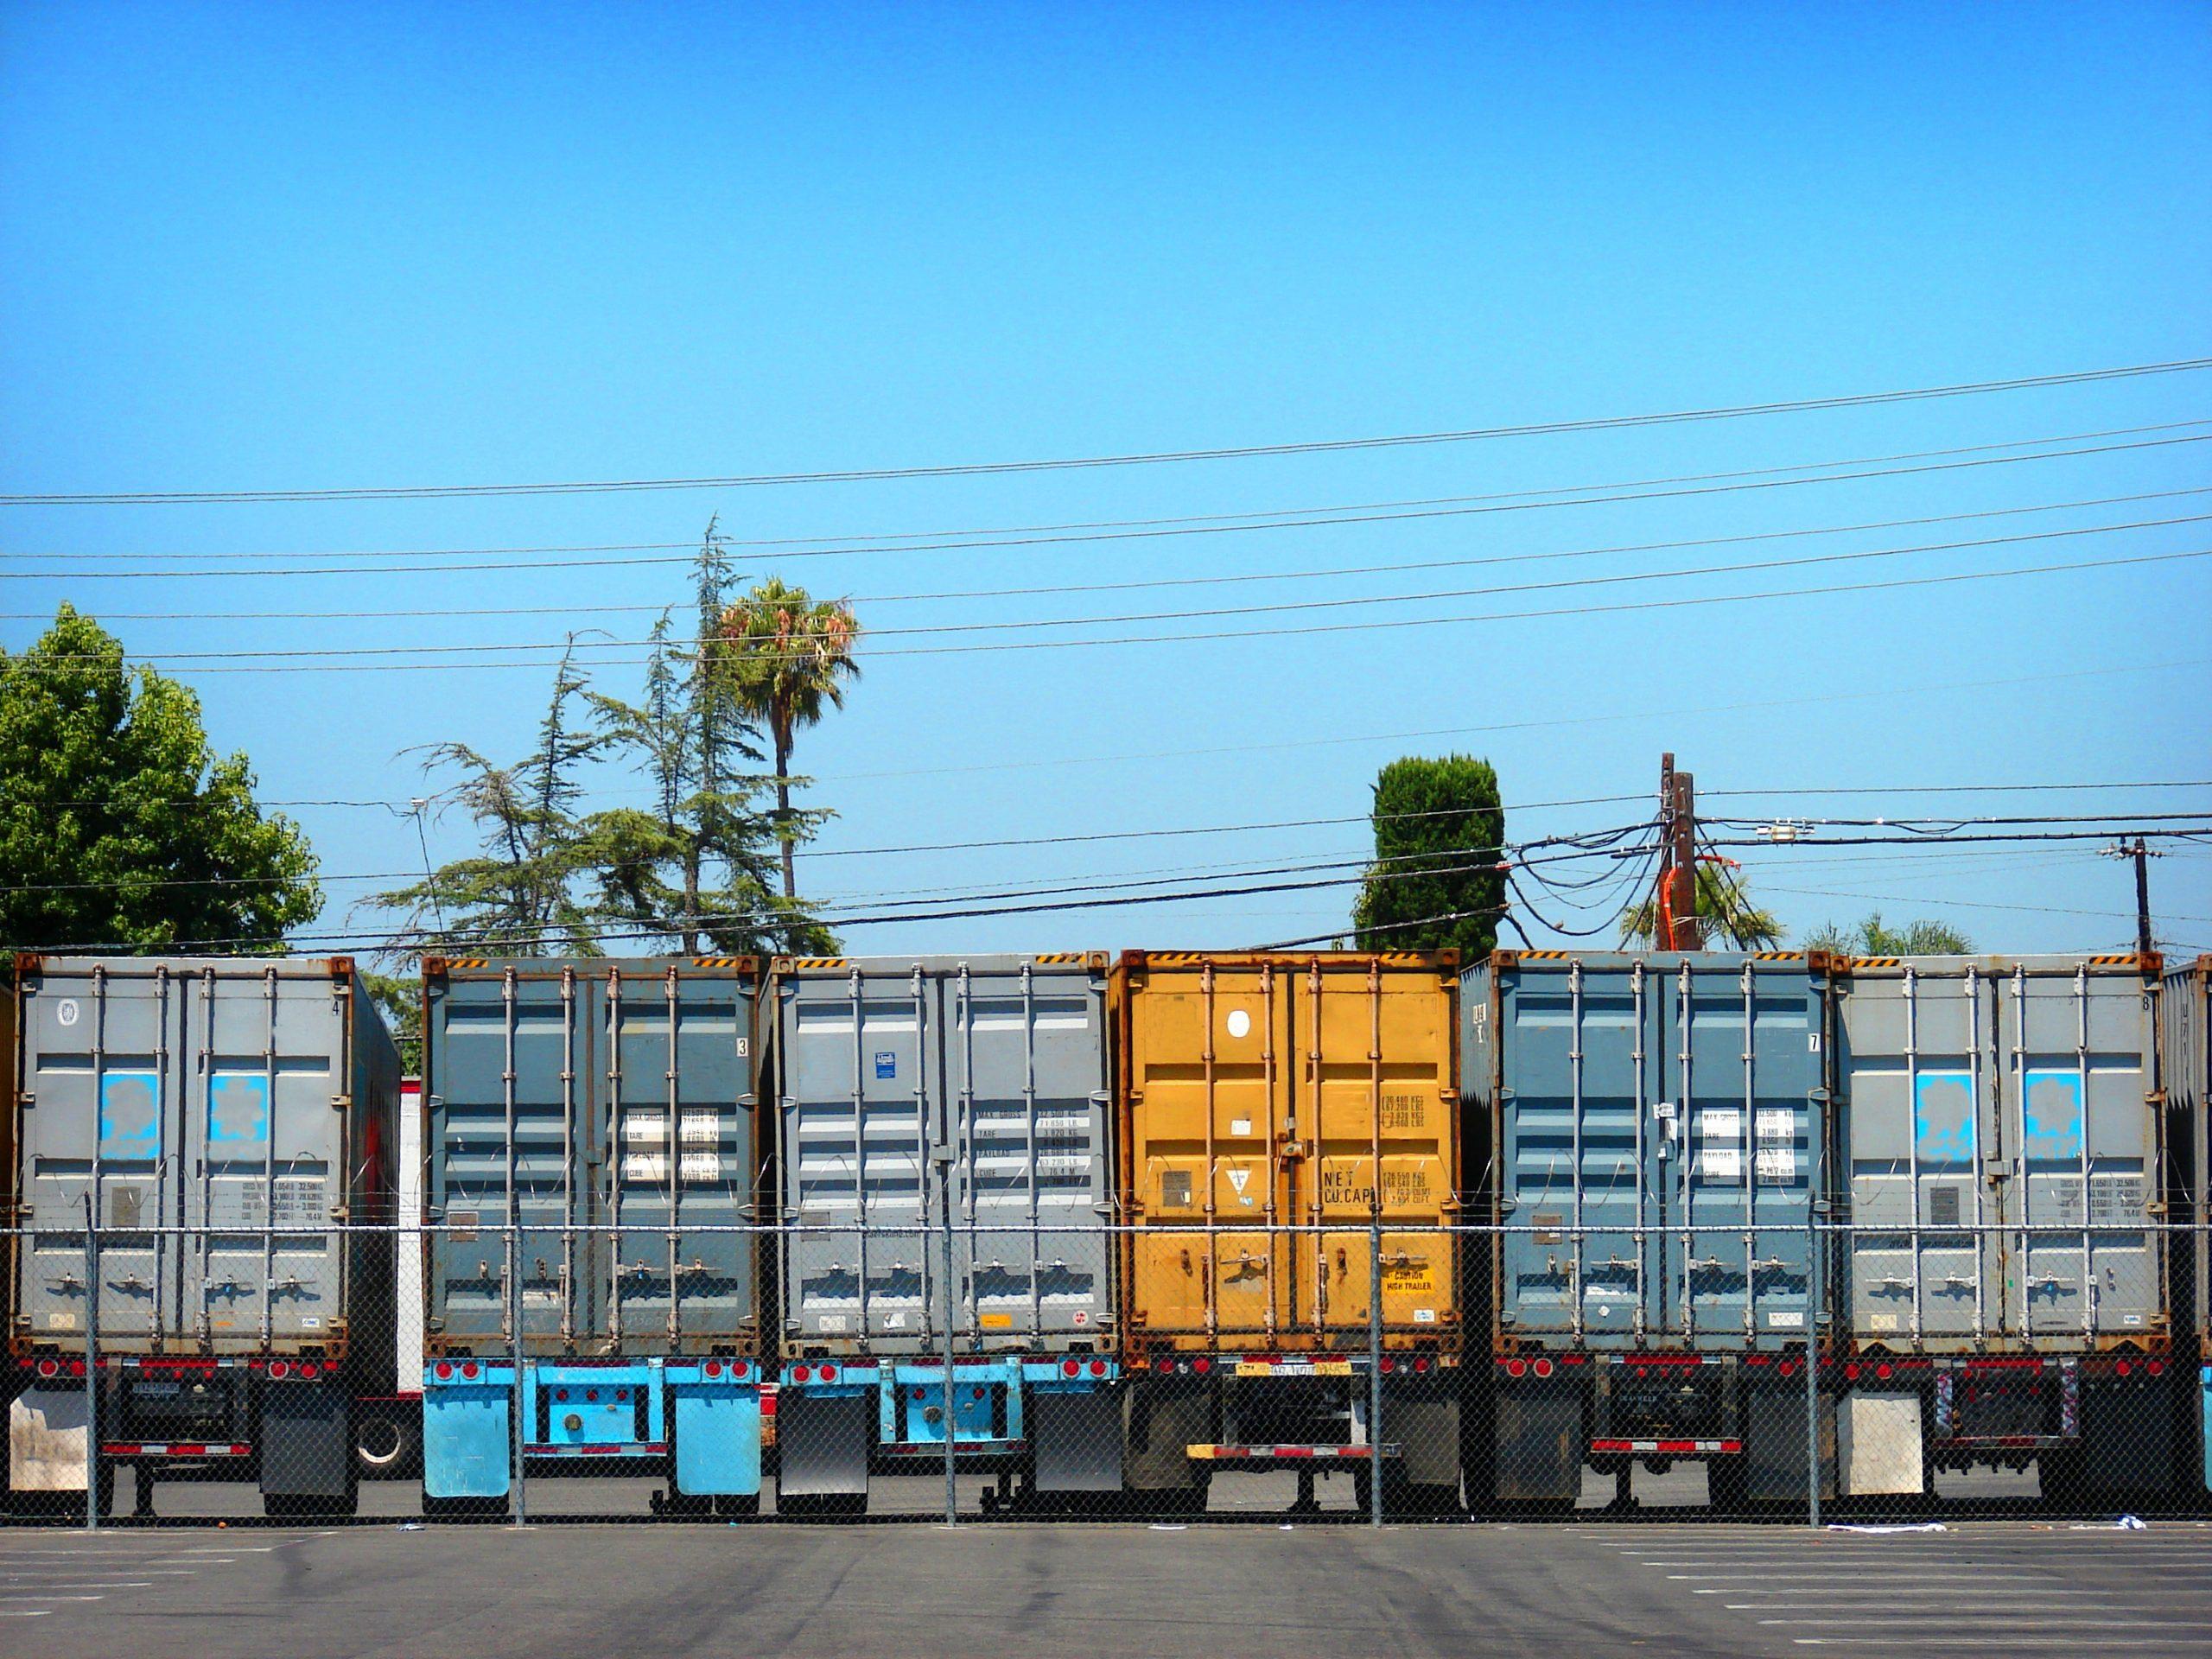 Foreign Truck Backs